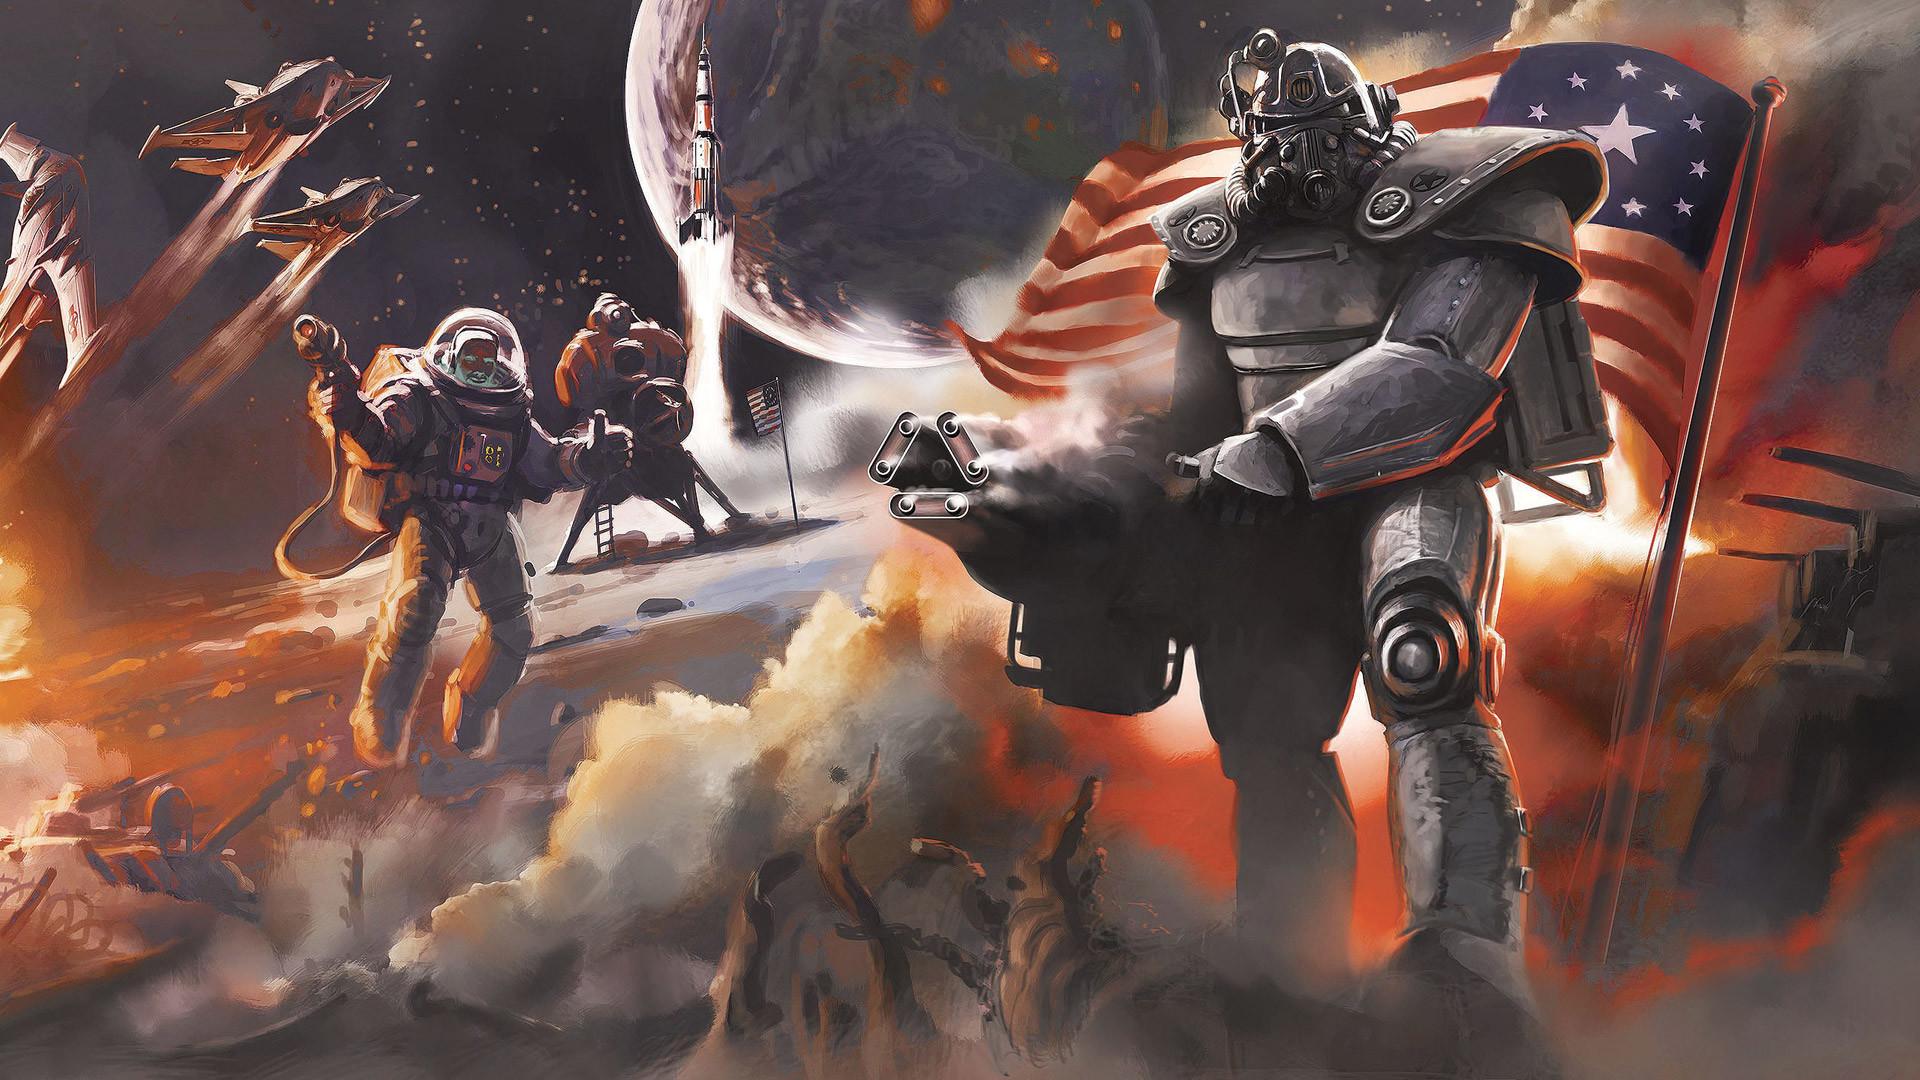 Fallout 4 Wallpaper in 1920×1080